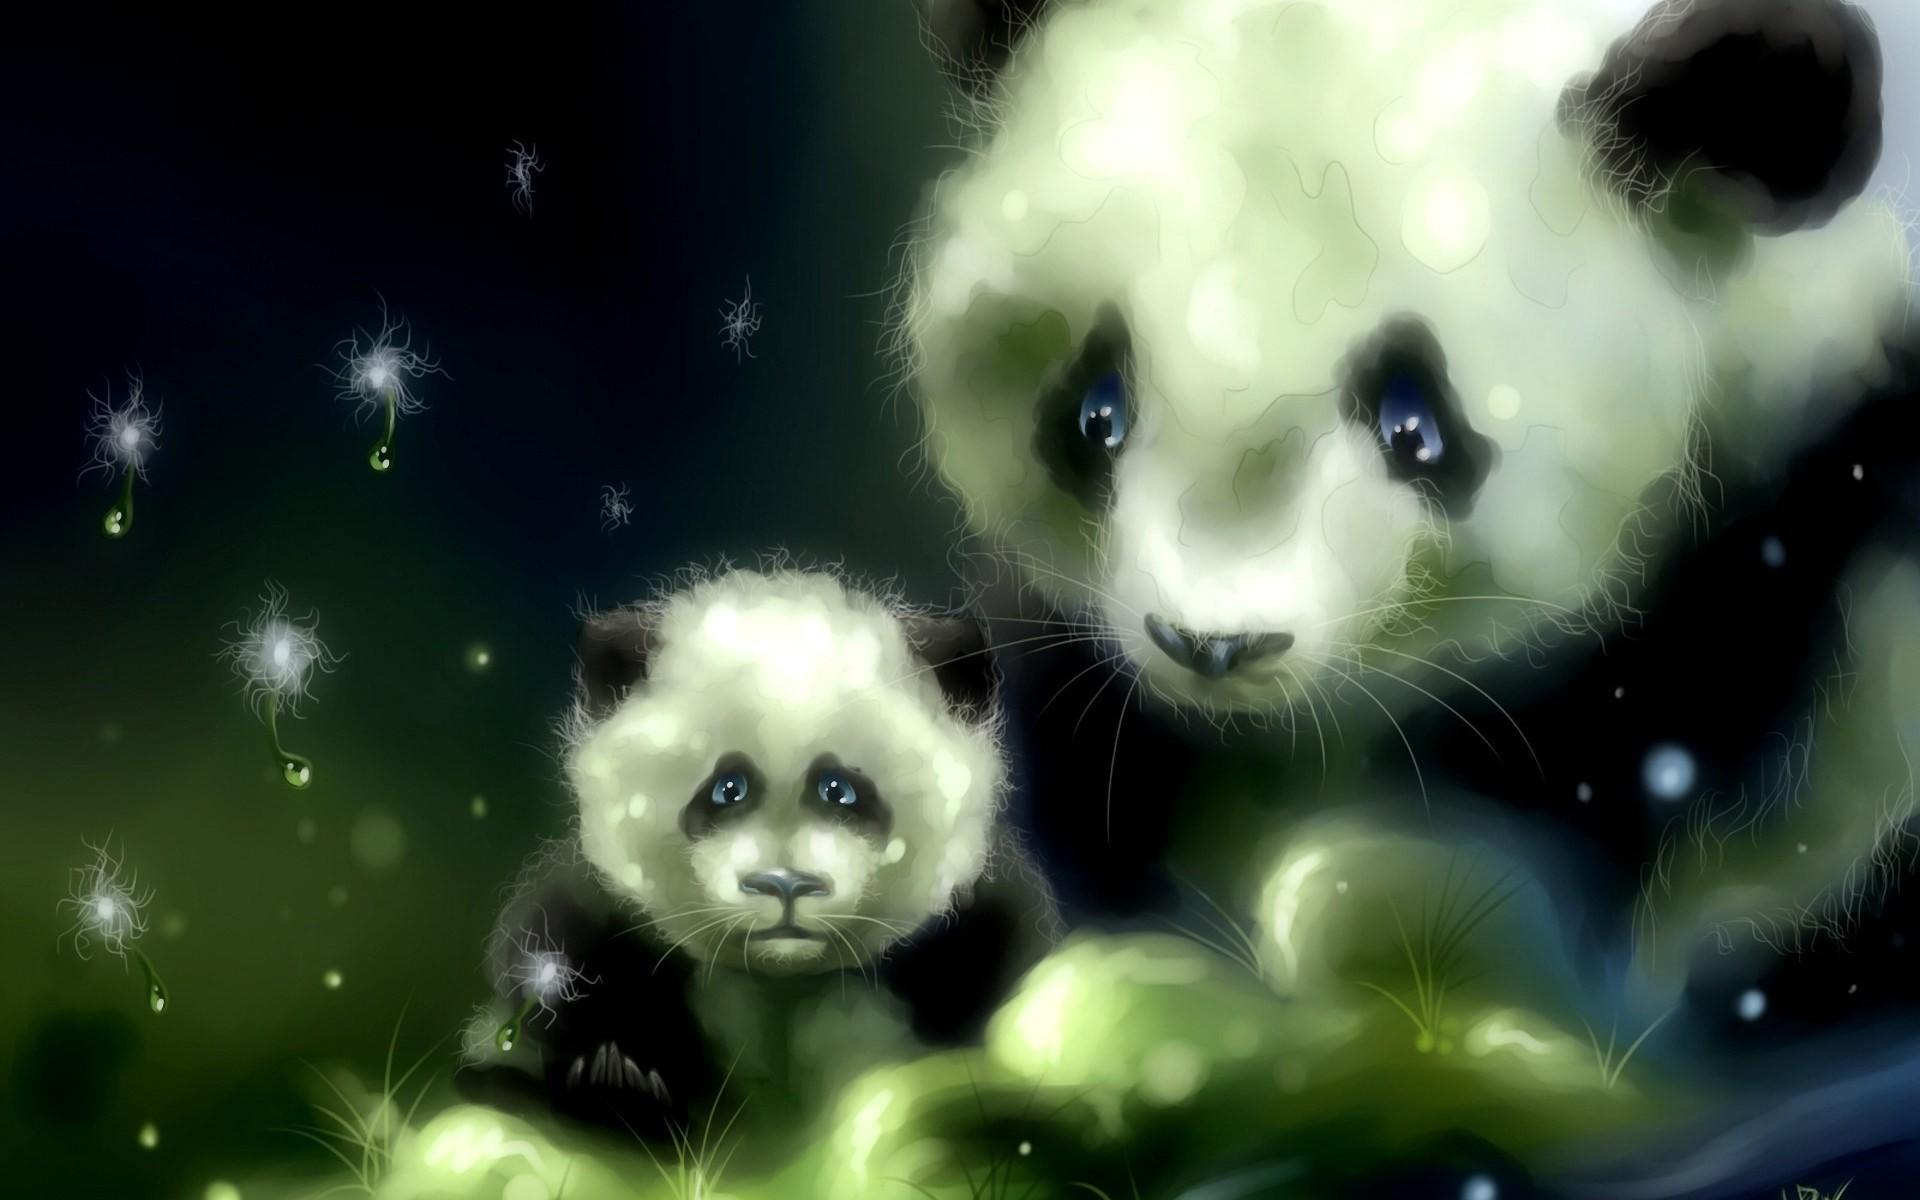 1920x1200 Kung Fu Panda HD Desktop Wallpaper Widescreen High